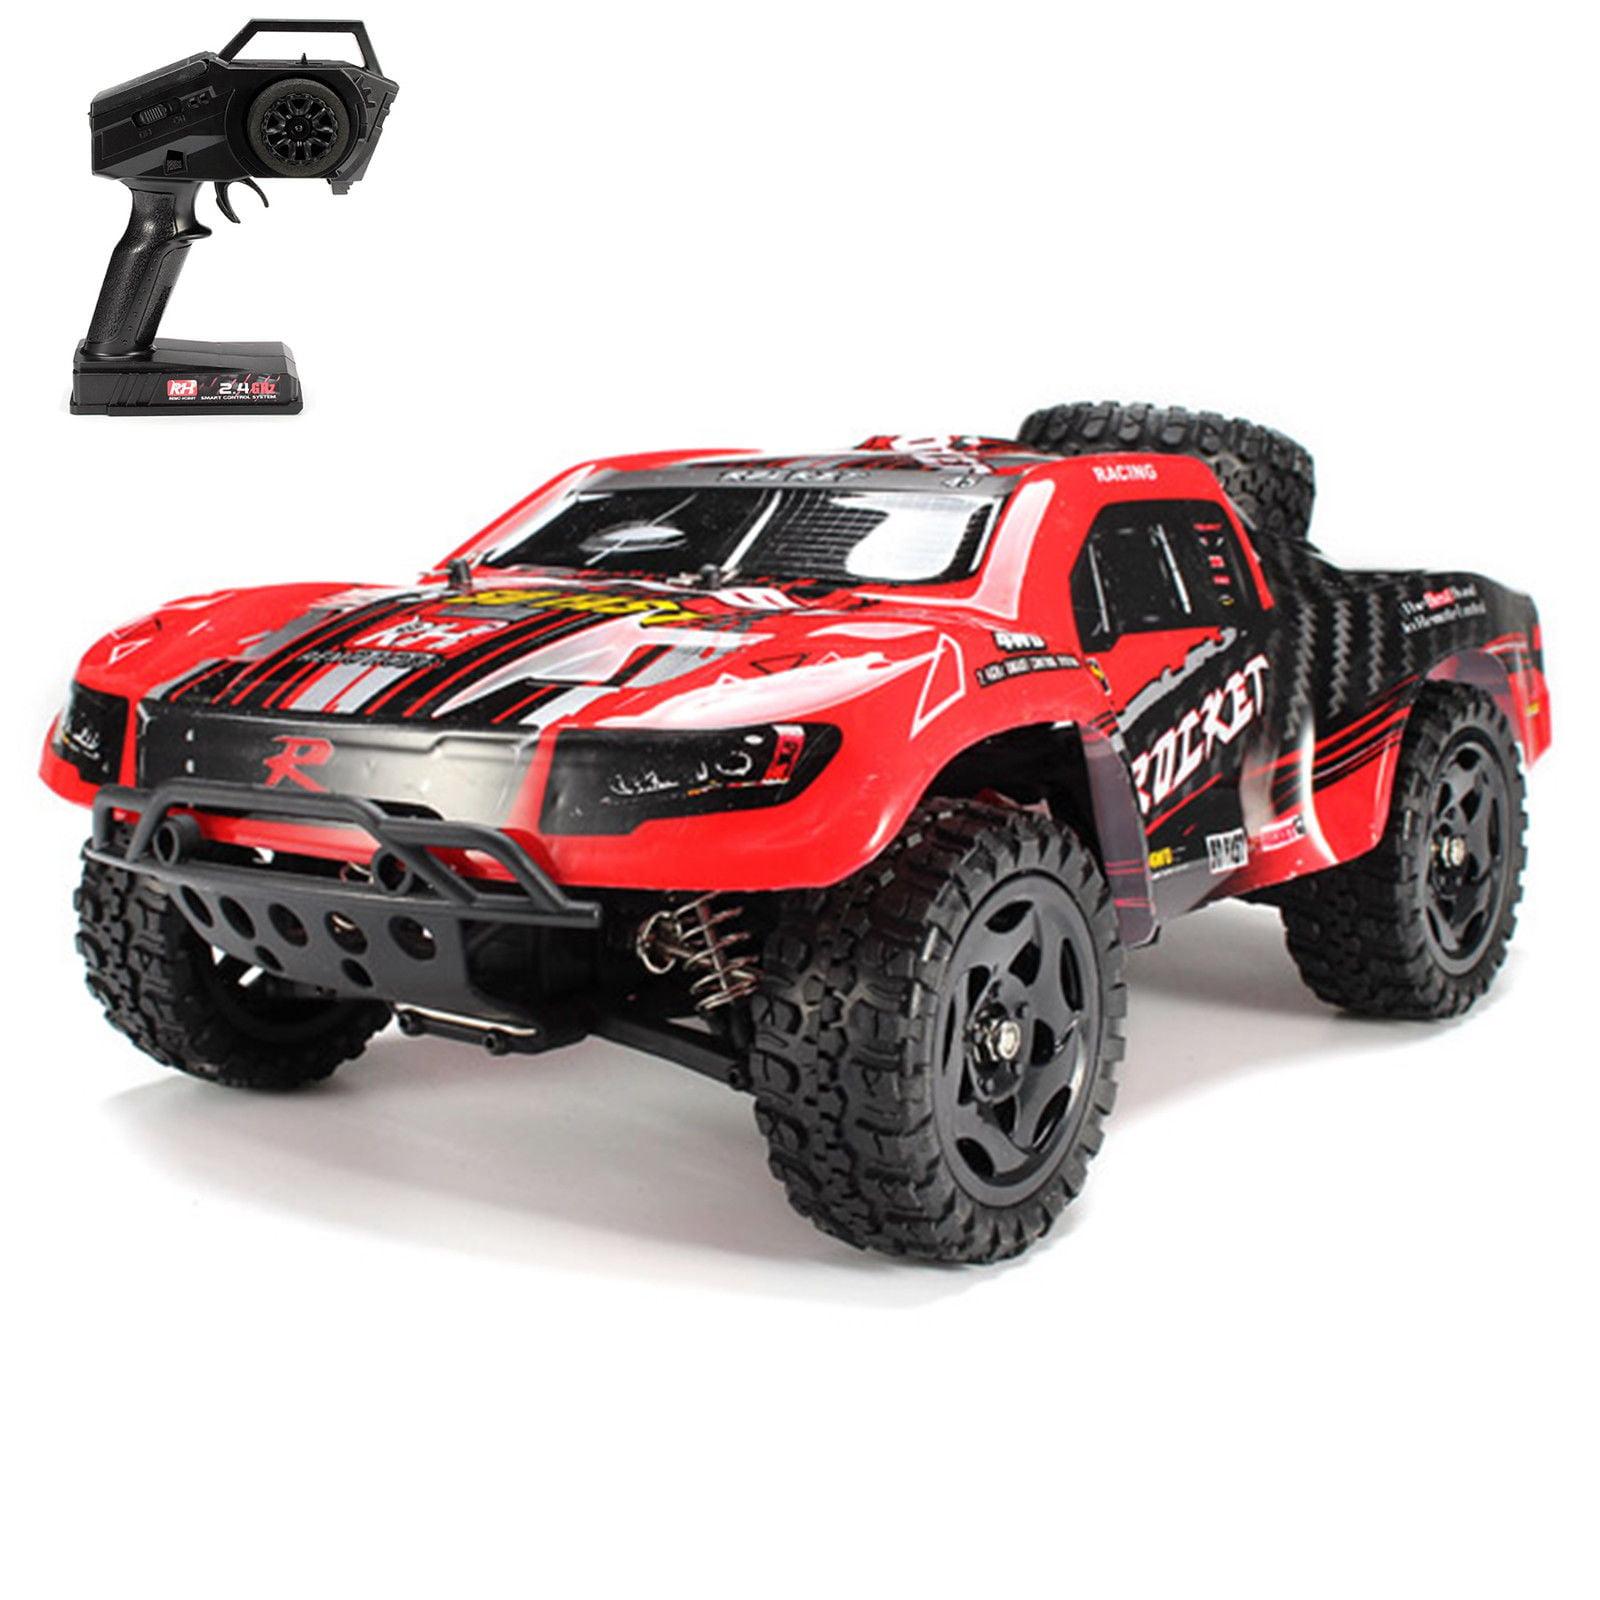 Remo 1621 Rc Car 1 16 2 4g 4wd 50km H Waterproof Brushed Short Course Suv Truck Walmart Com Walmart Com